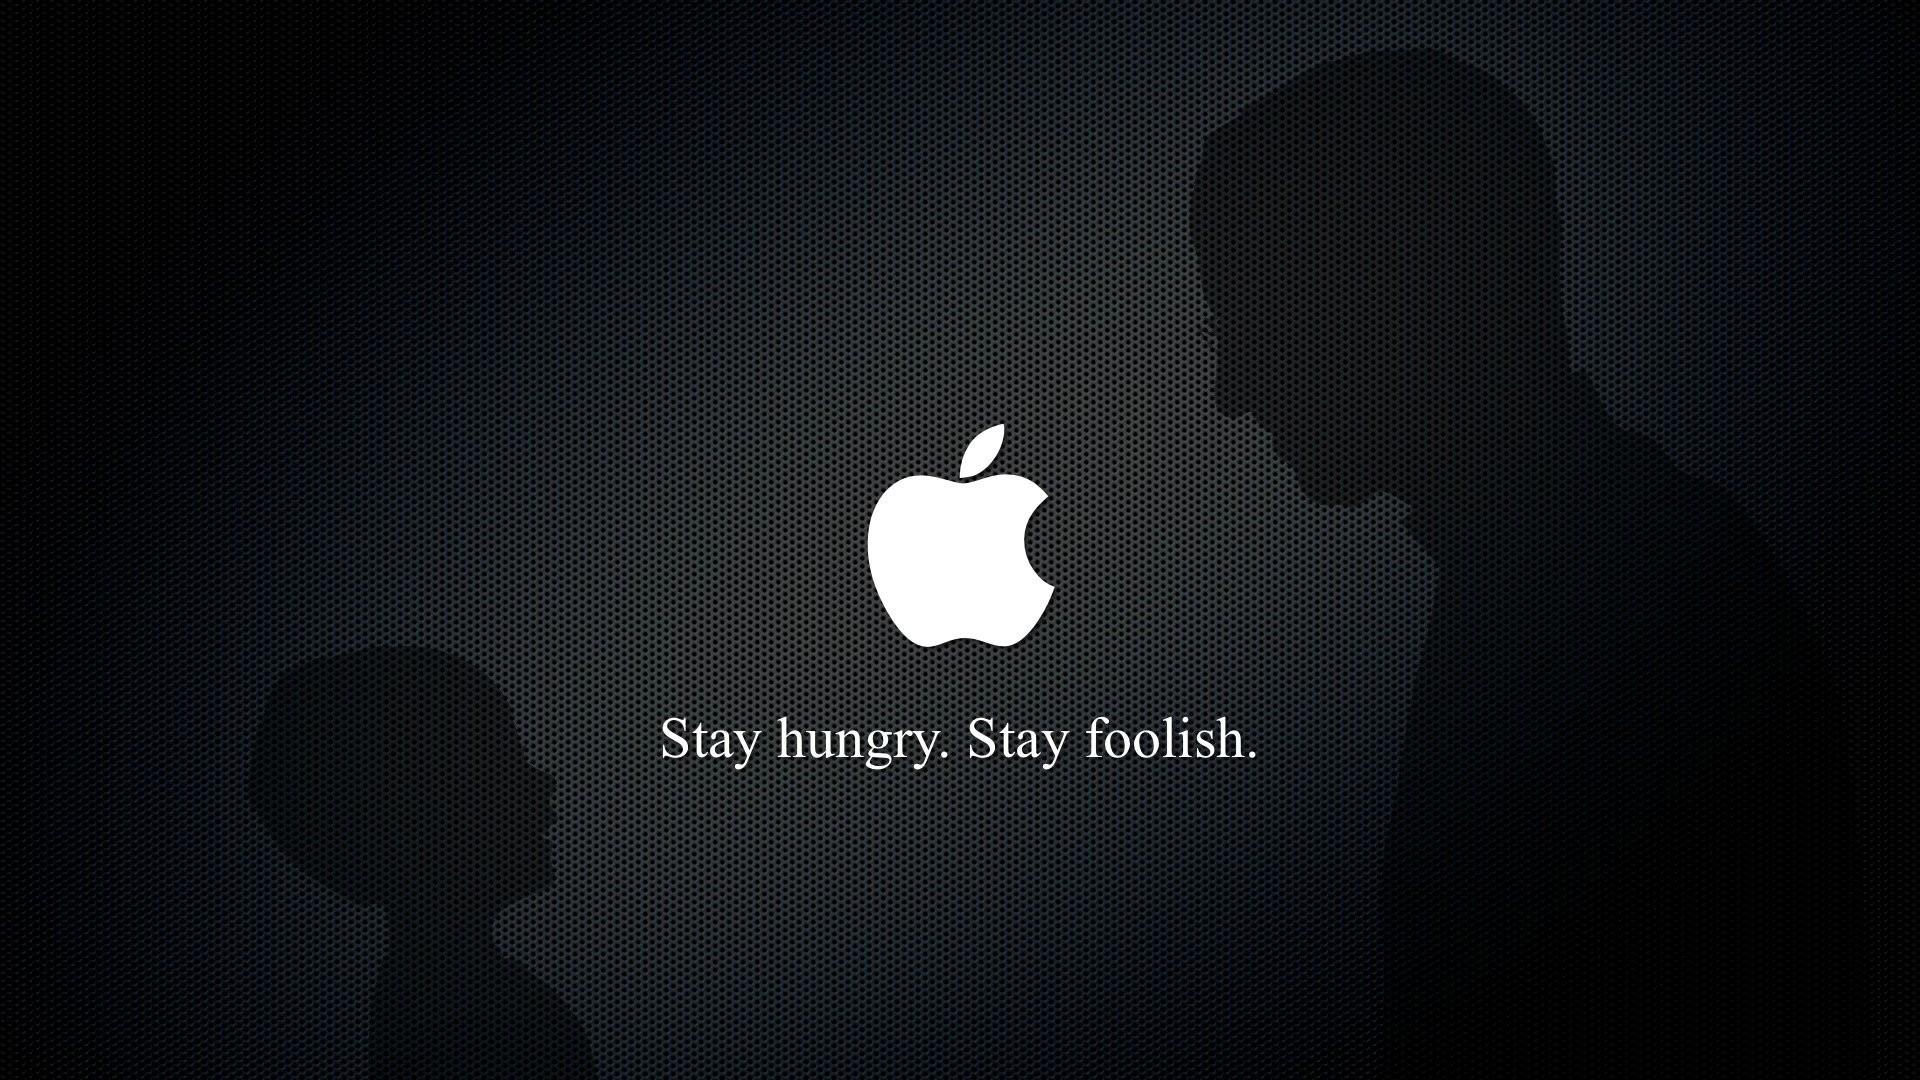 Steve Jobs free download wallpaper